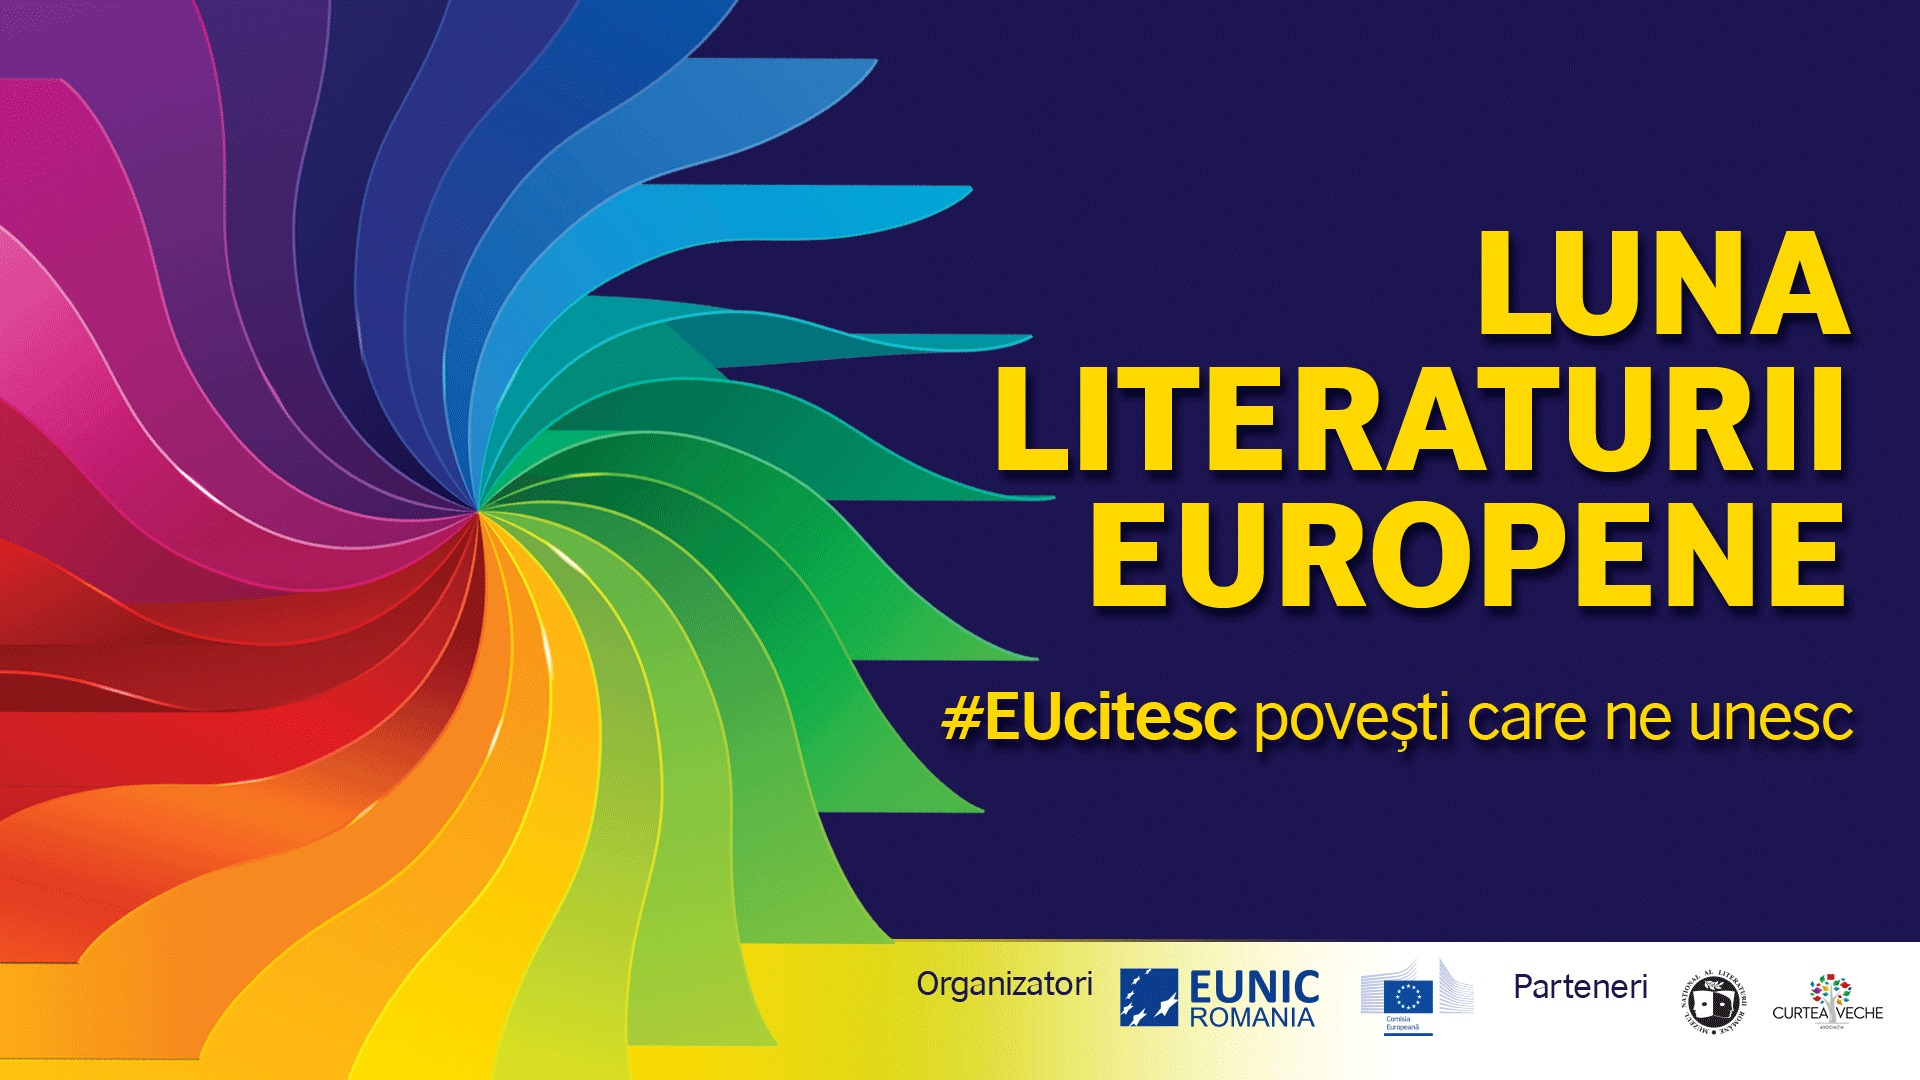 EUcitesc | Luna Literaturii Europene